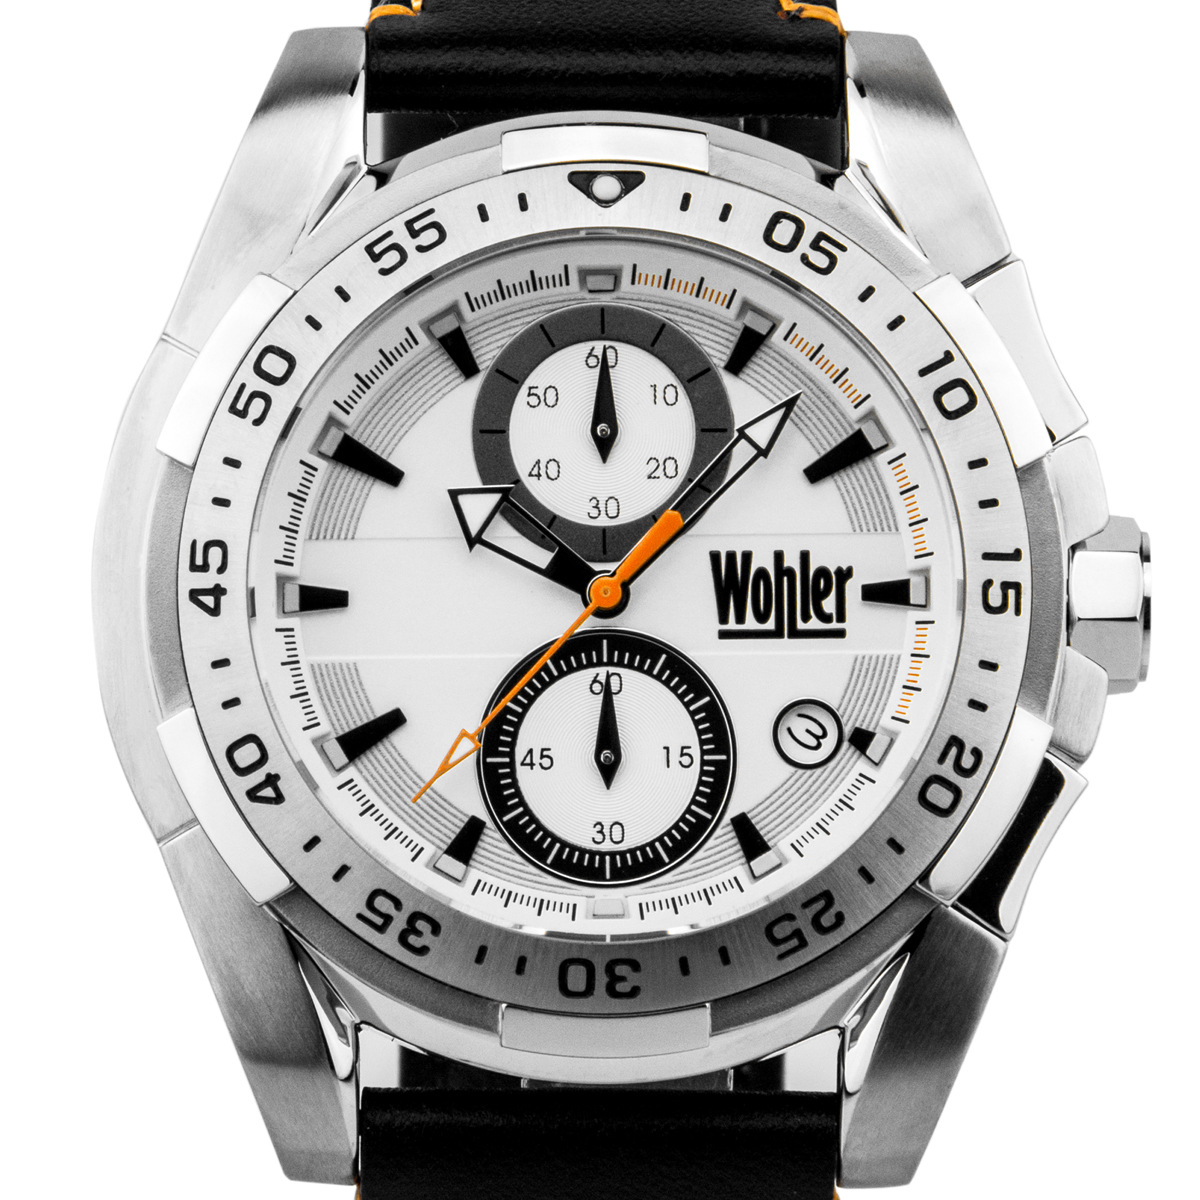 Wohler - Otto Men's sport chronograph, genuine leather